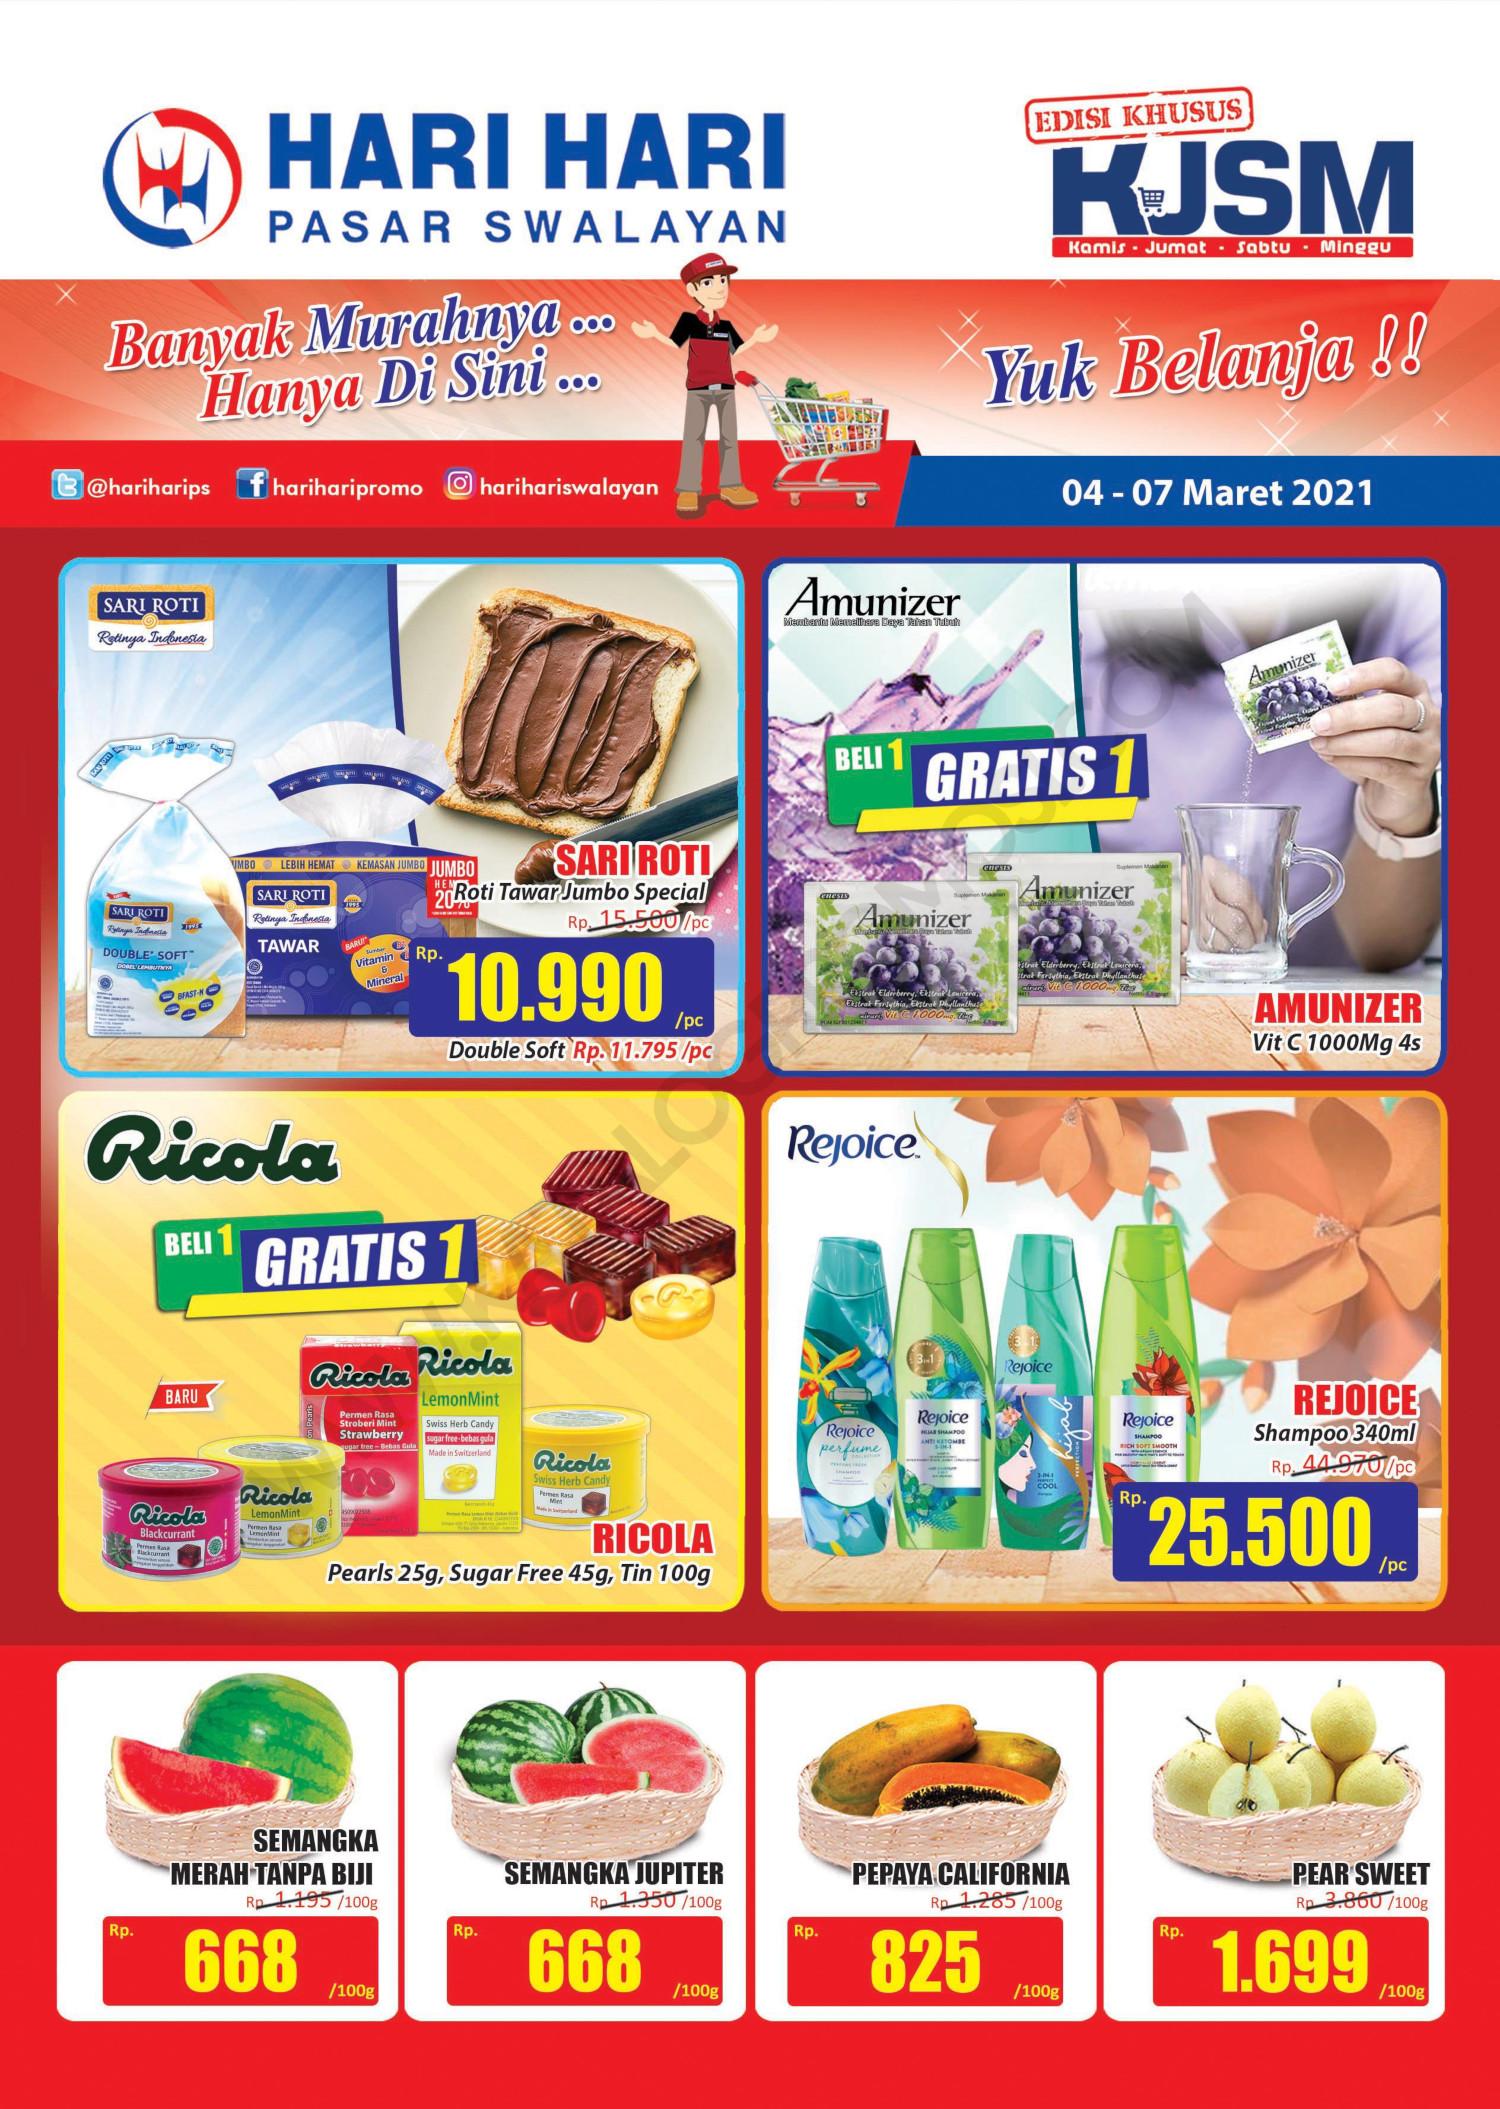 Promo Hari Hari Pasar Swalayan Weekend JSM Periode 04-07 Maret 2021